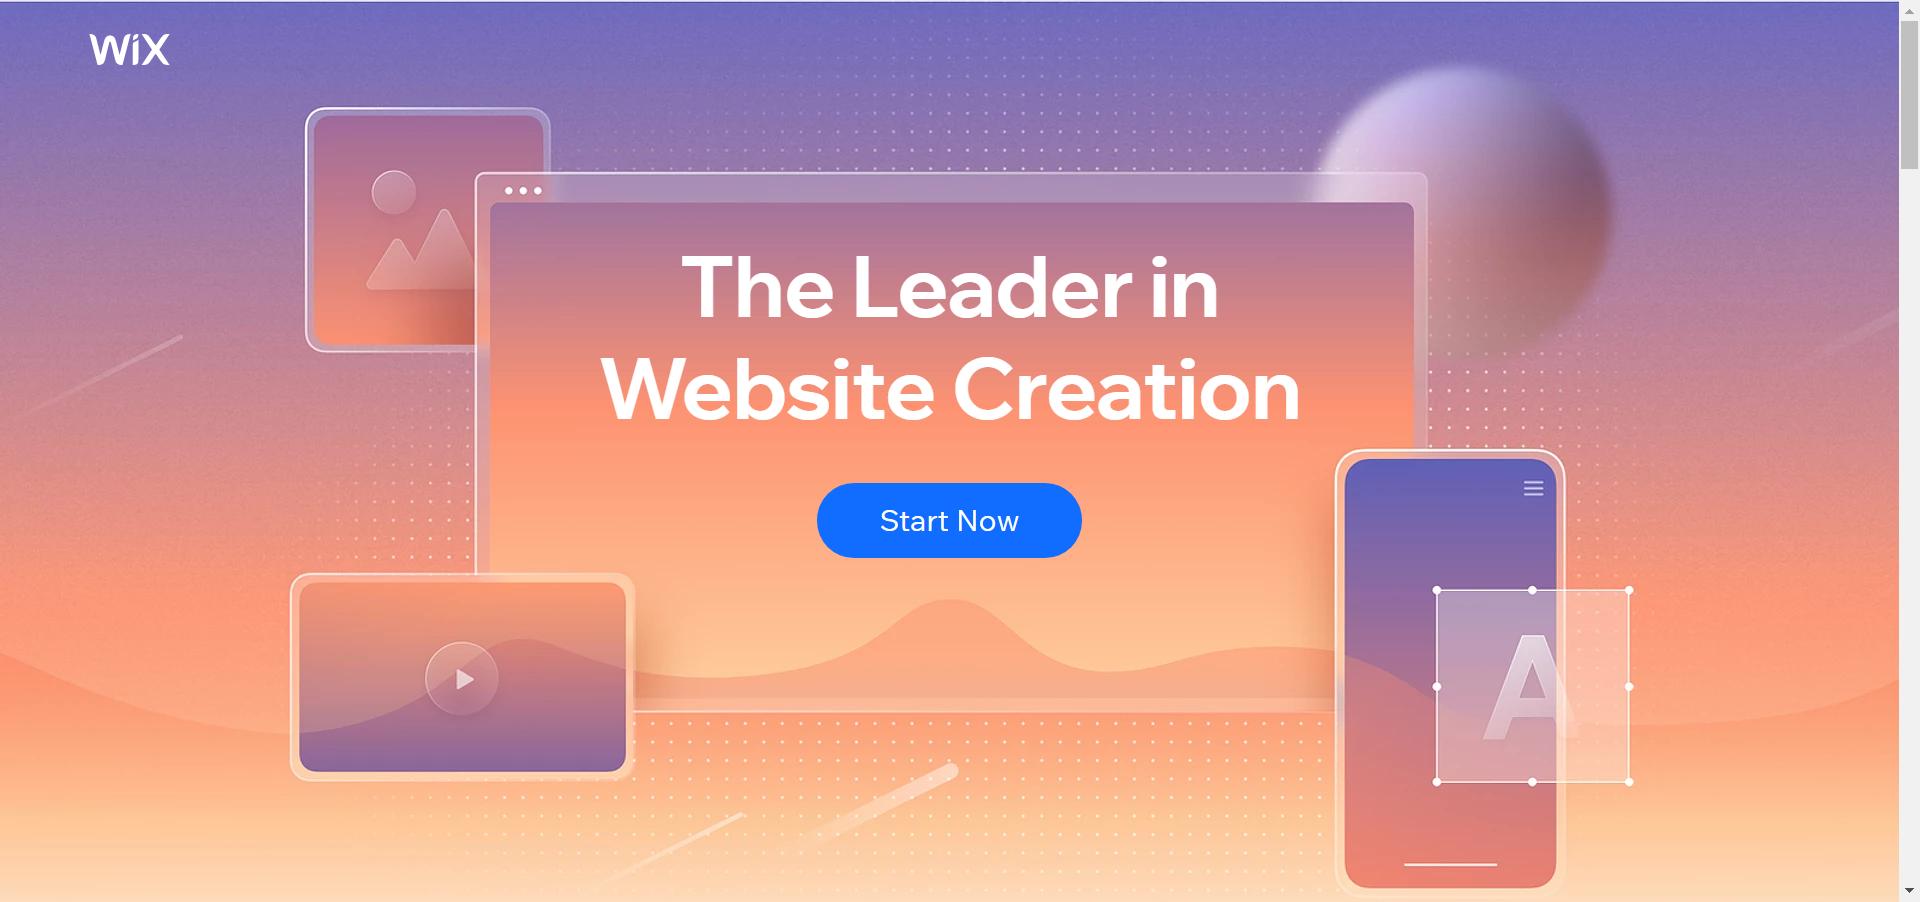 wix-website-creation